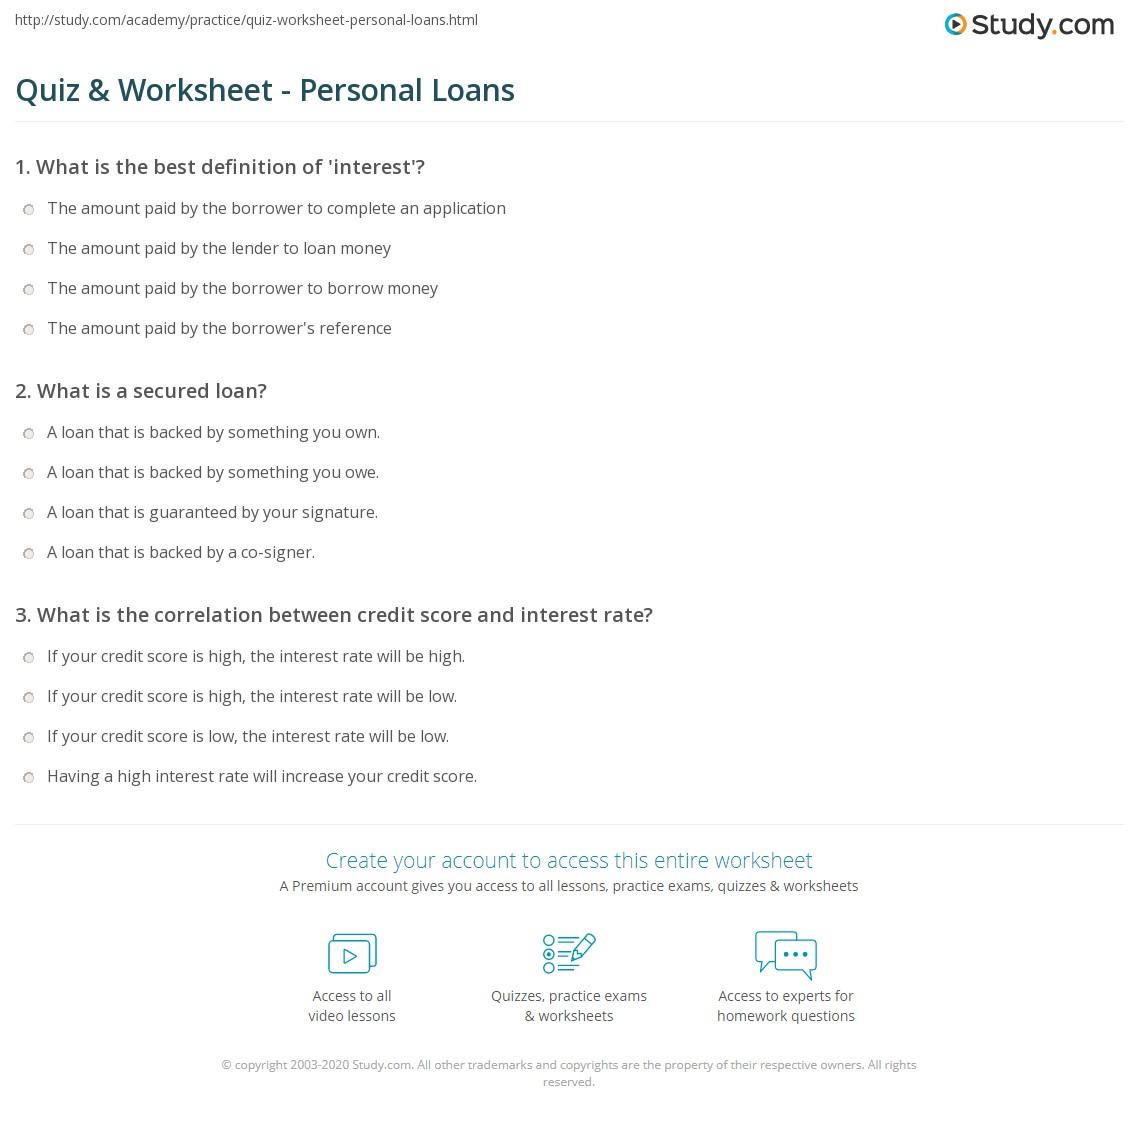 quiz & worksheet - personal loans | study